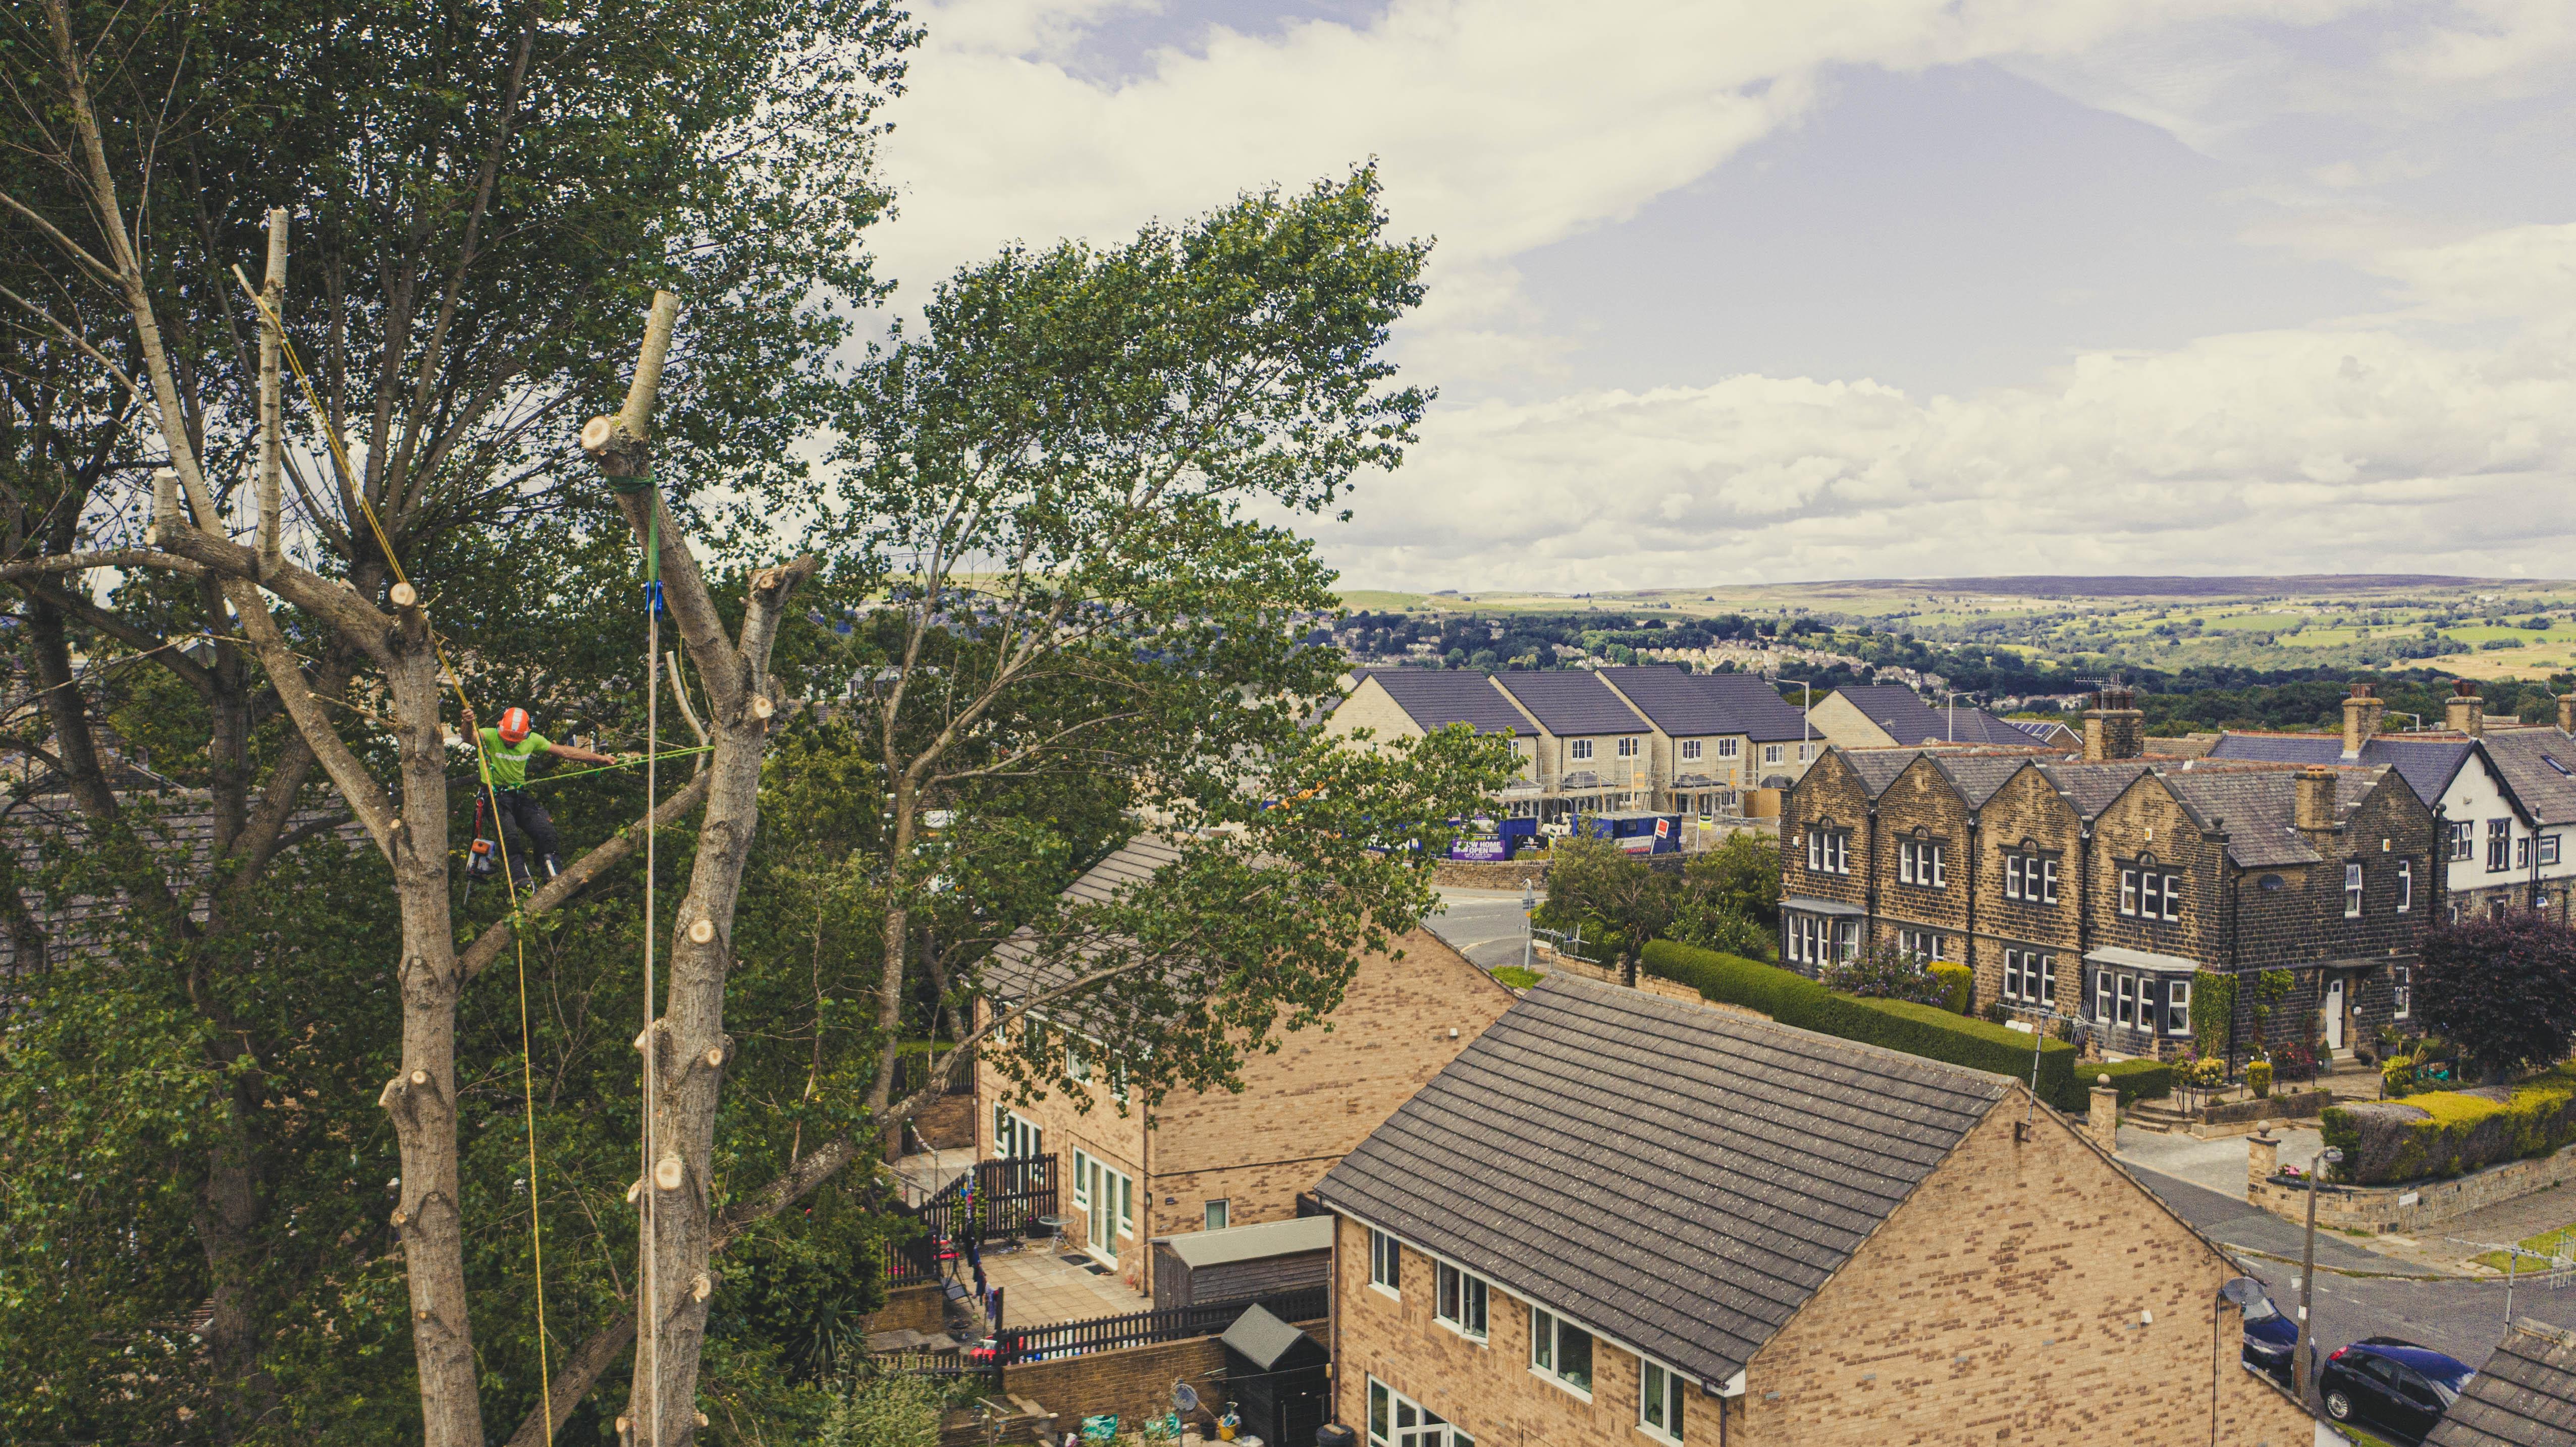 West-Yorkshire-Tree-Dismantle-3